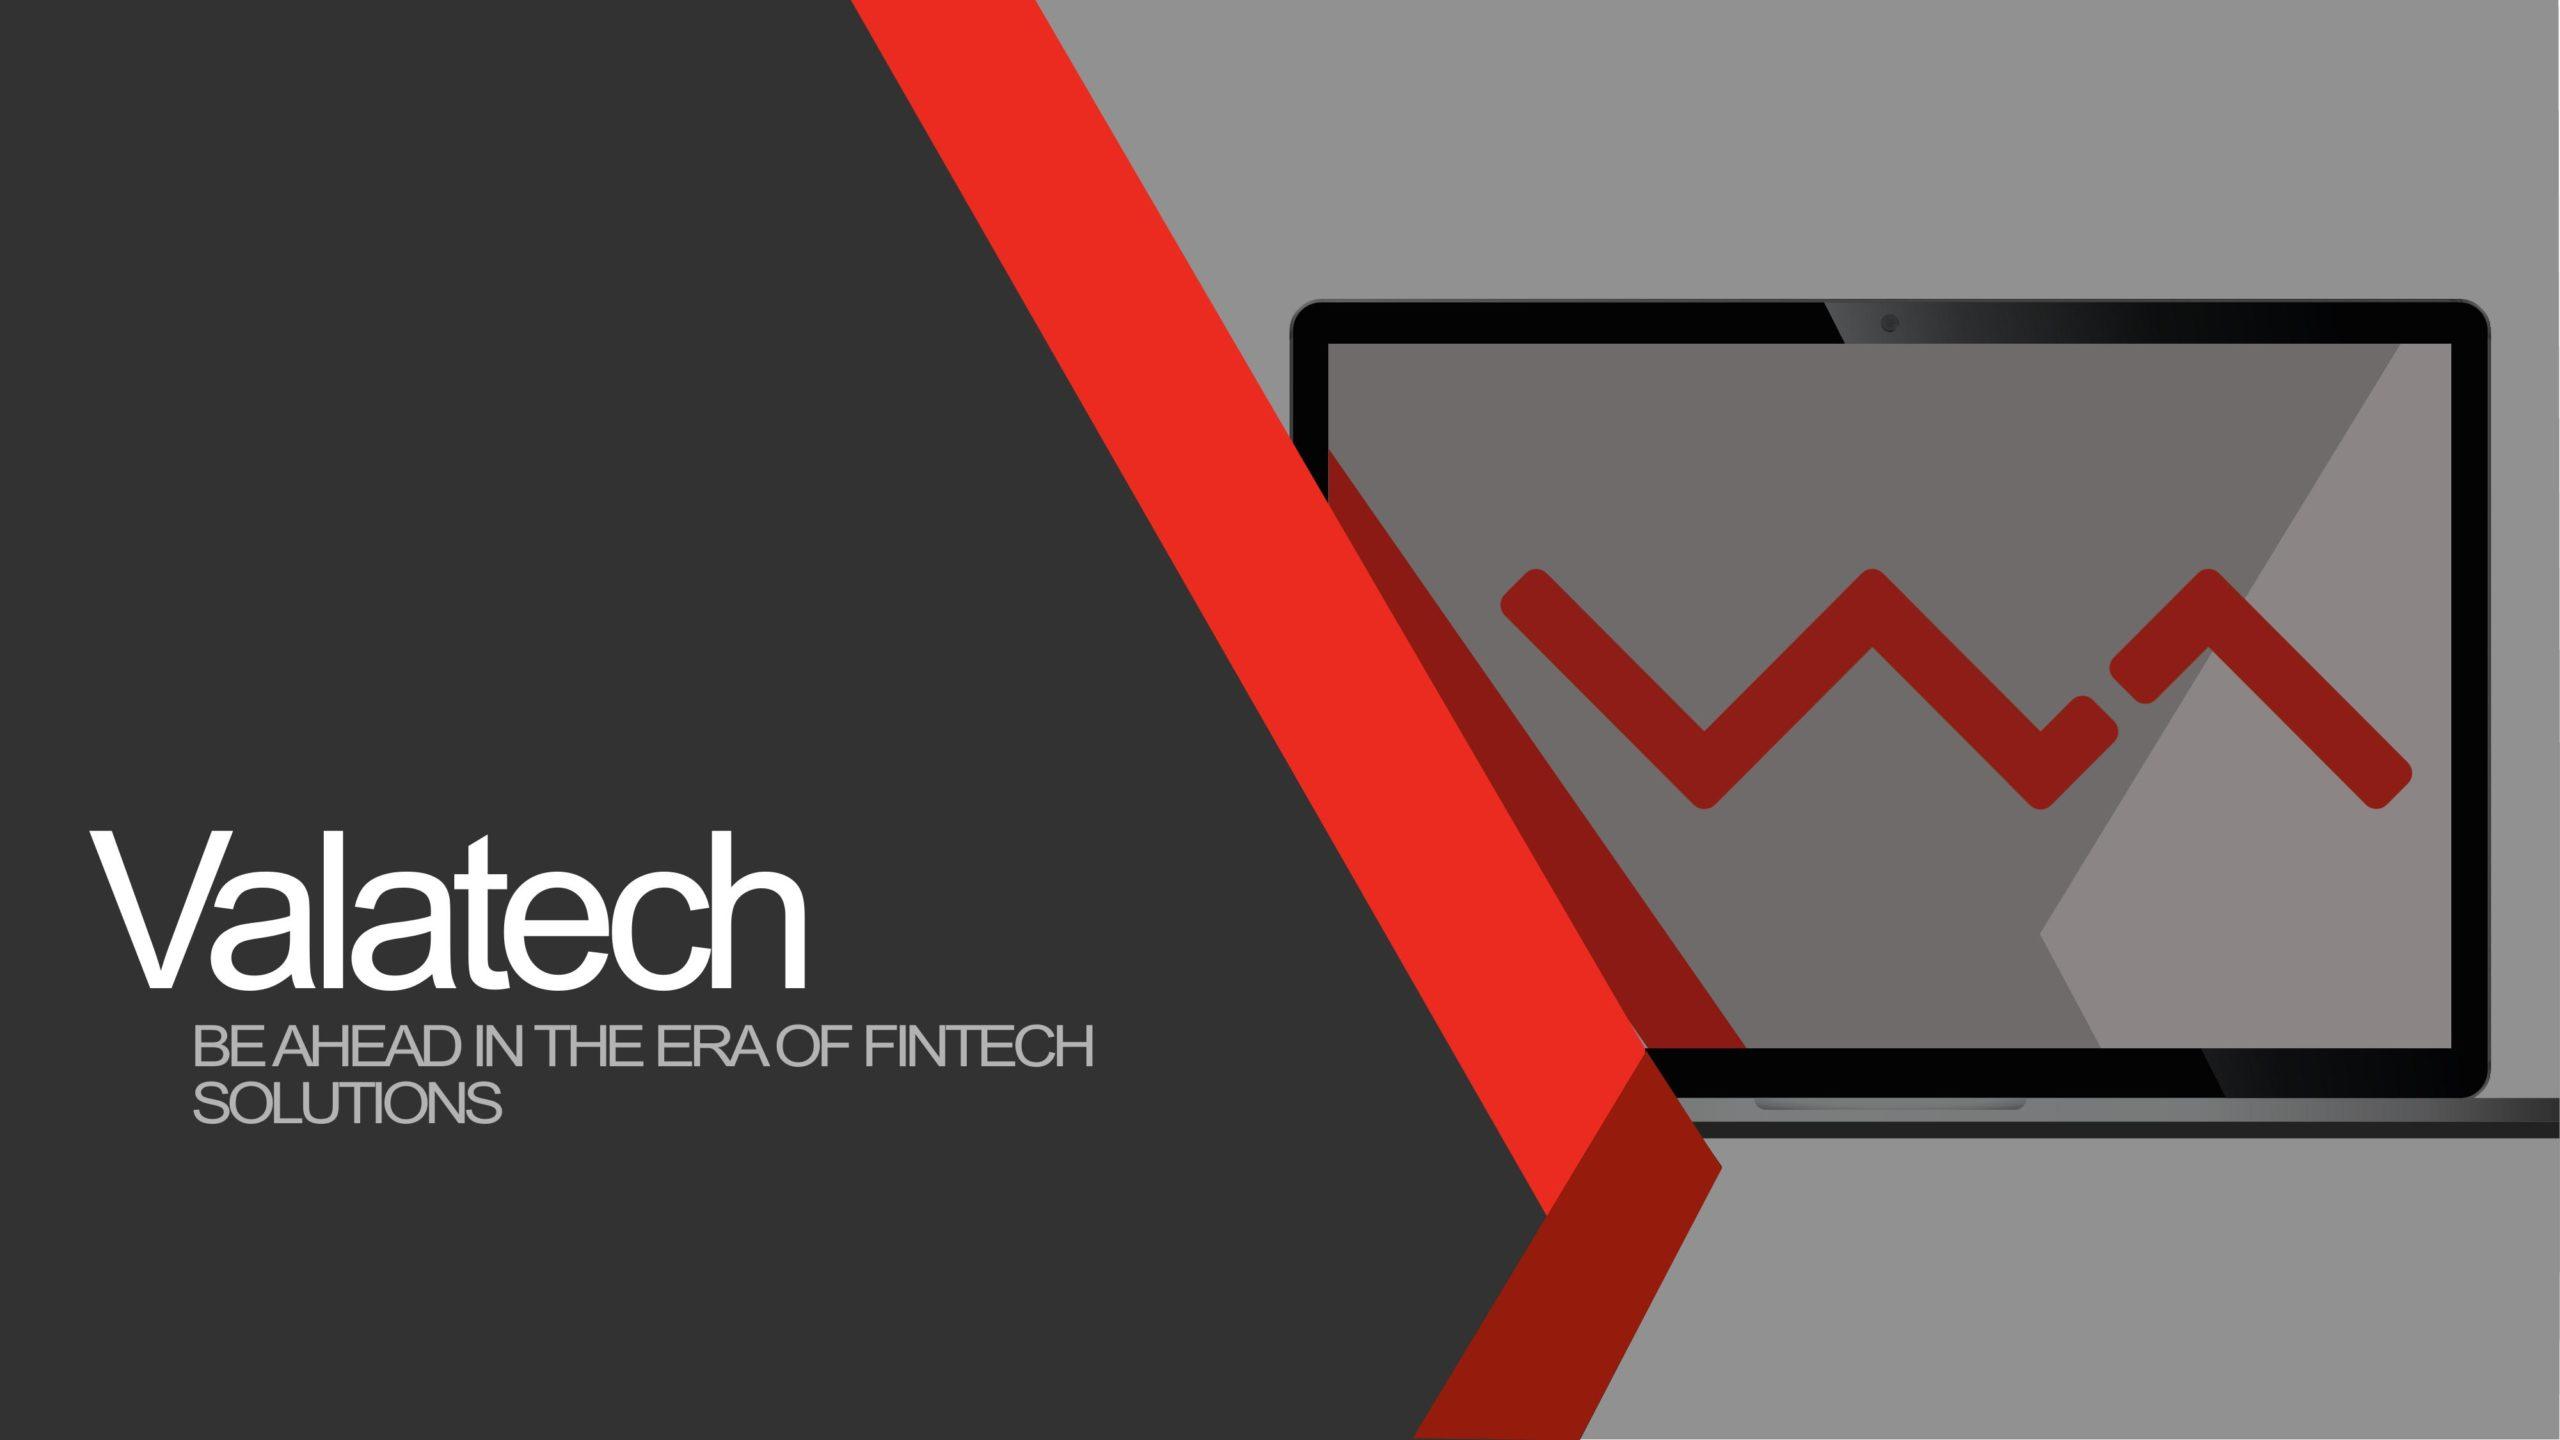 VaLaTech